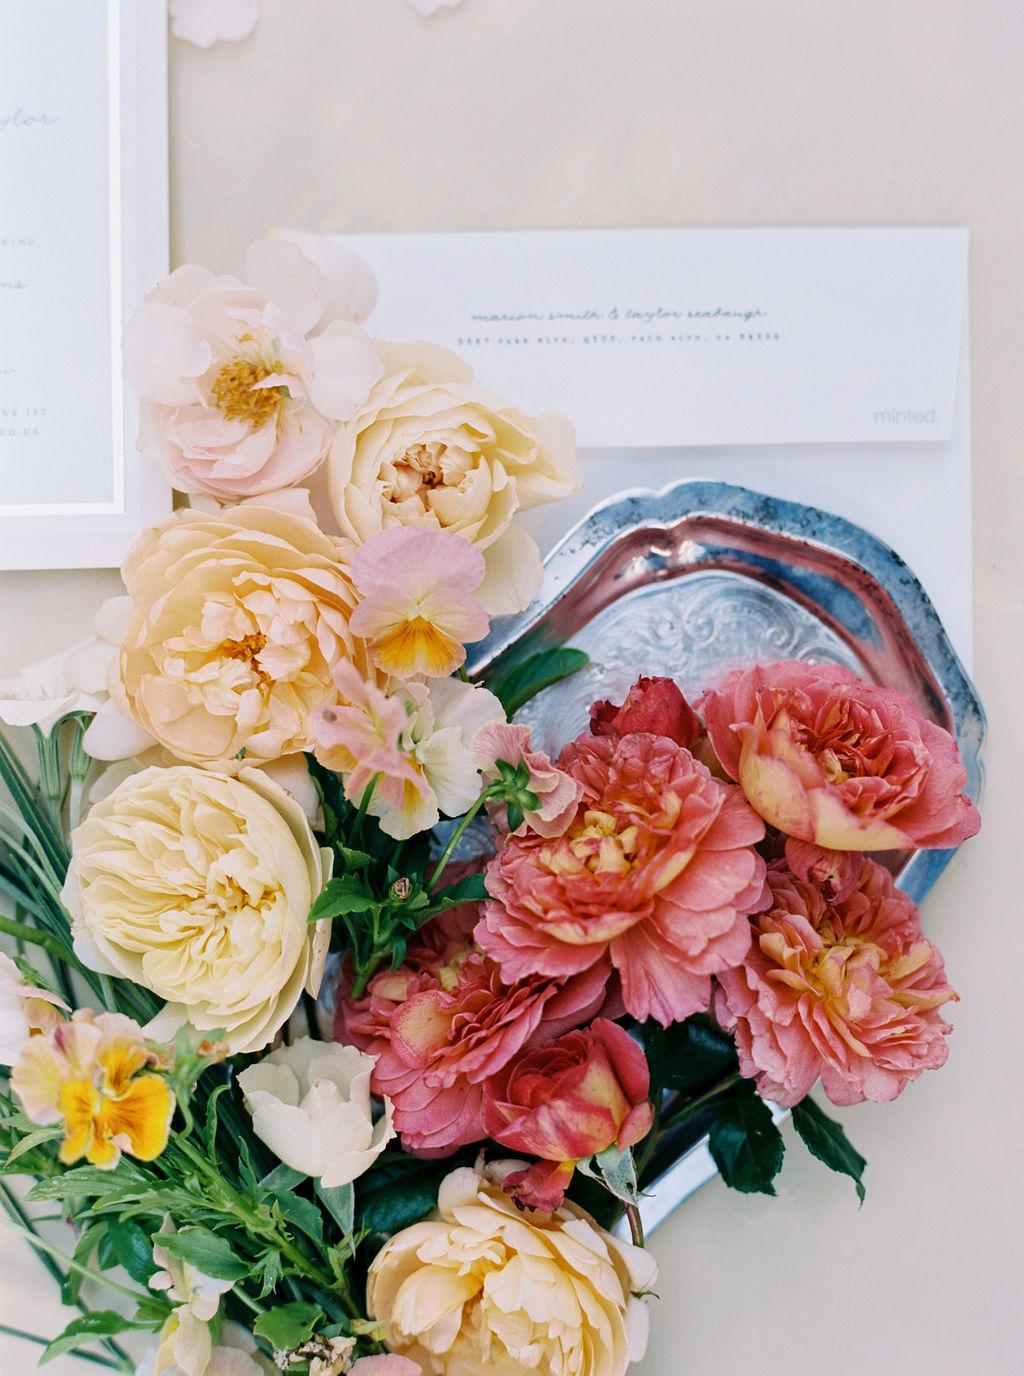 Alexandra-Elise-Photography-Film-Wedding-Photographer-Sonnenberg-Gardens-Finger-Lakes-Canandaigua-Reception-024.jpg